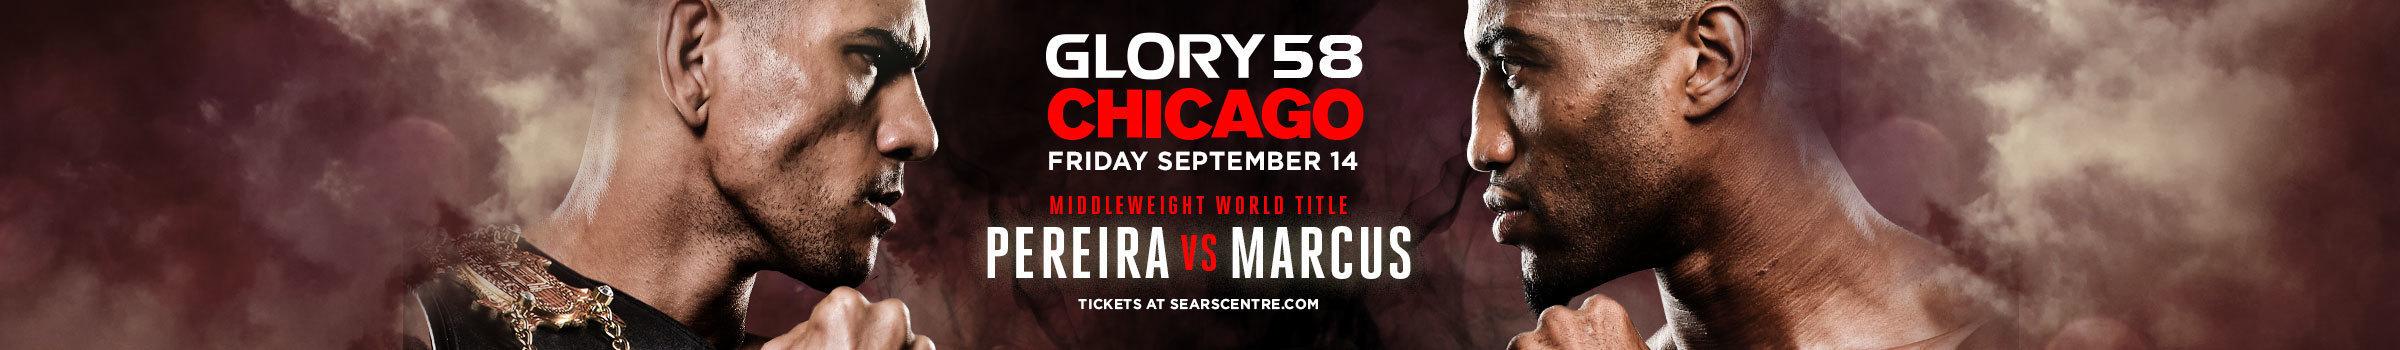 GLORY 58 Chicago